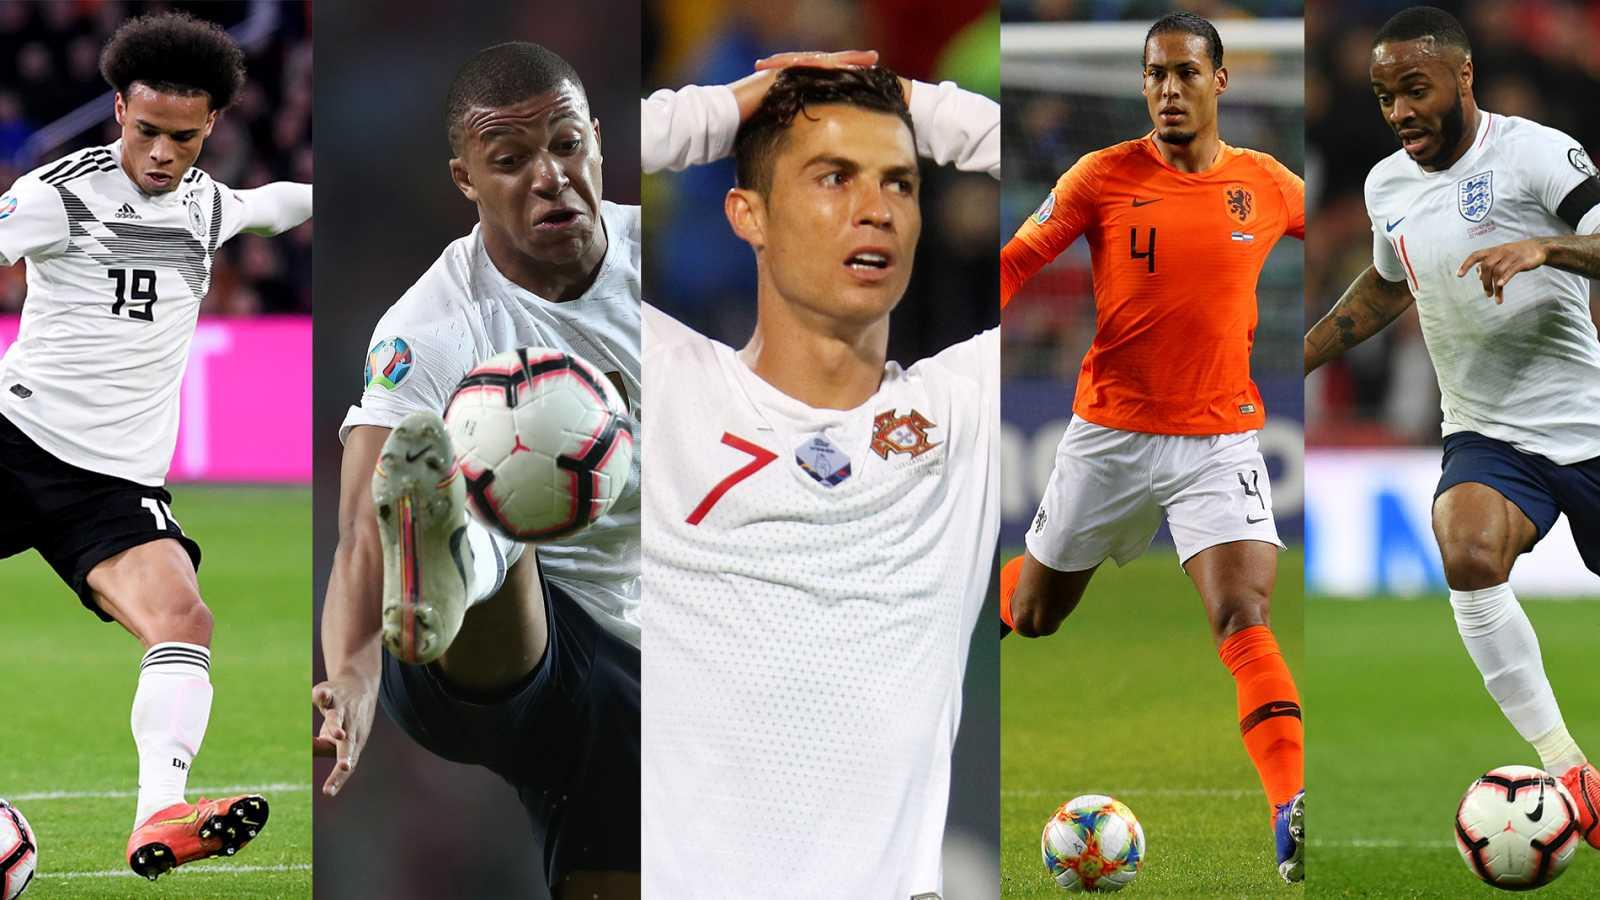 Sané (Alemania), Mbappé (Francia), Cristiano Ronaldo (Portugal), Van Dijk (Holanda) y Sterling (Inglaterra)